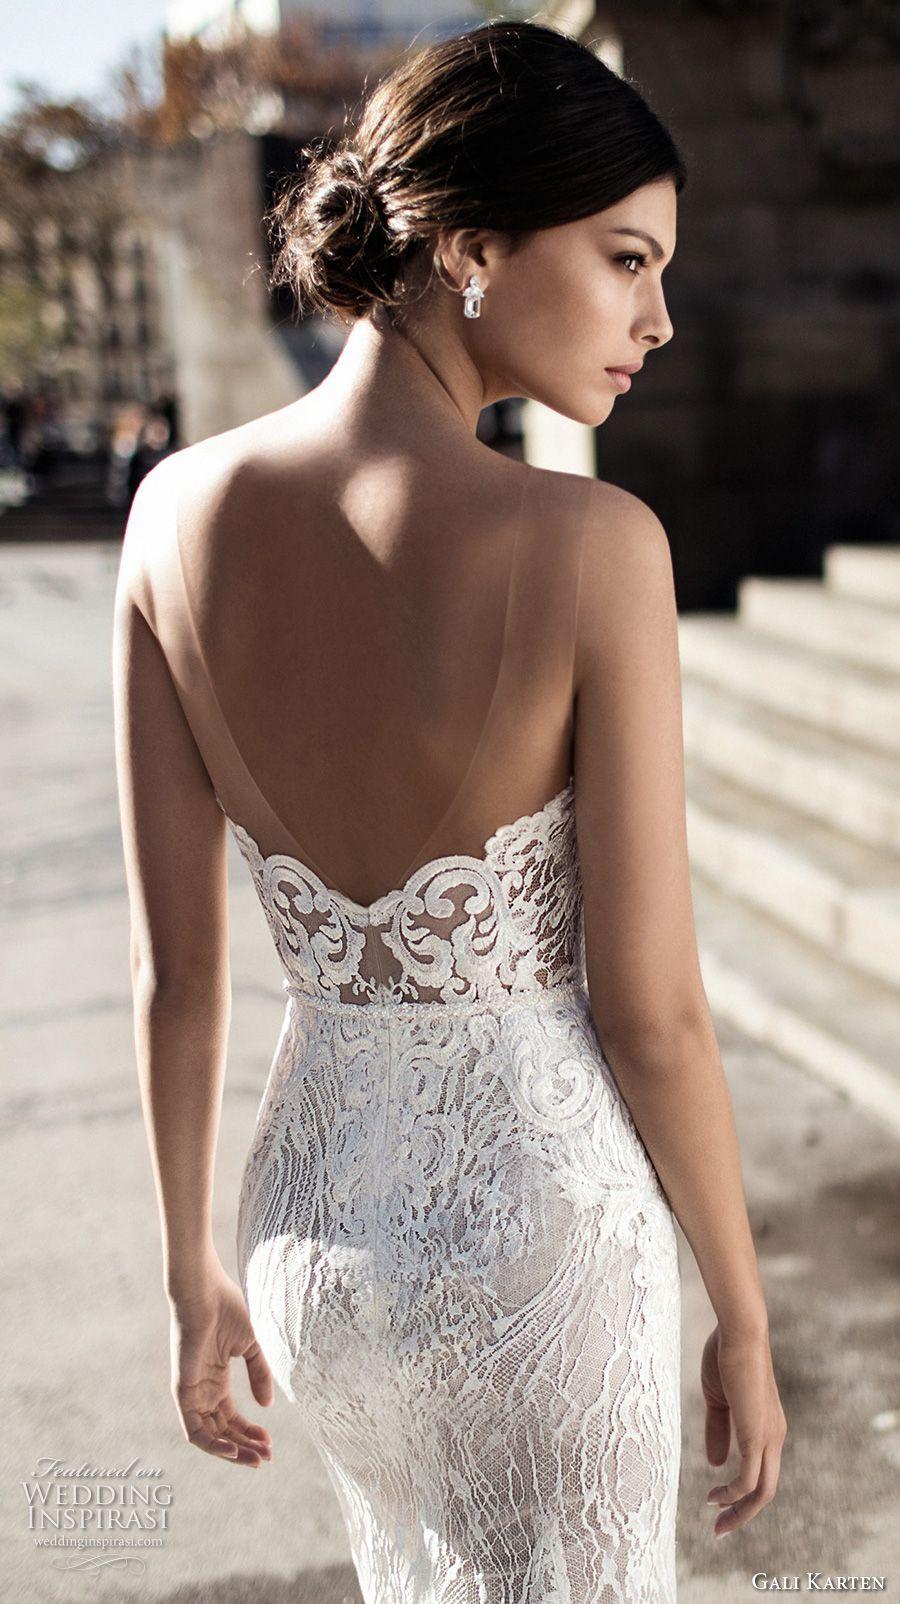 37bd8dd8c59 Gali Karten 2017 bridal long sleeves strapless sweetheart neckline full  embellishment elegant sexy sheath wedding dress short train (8) zbv